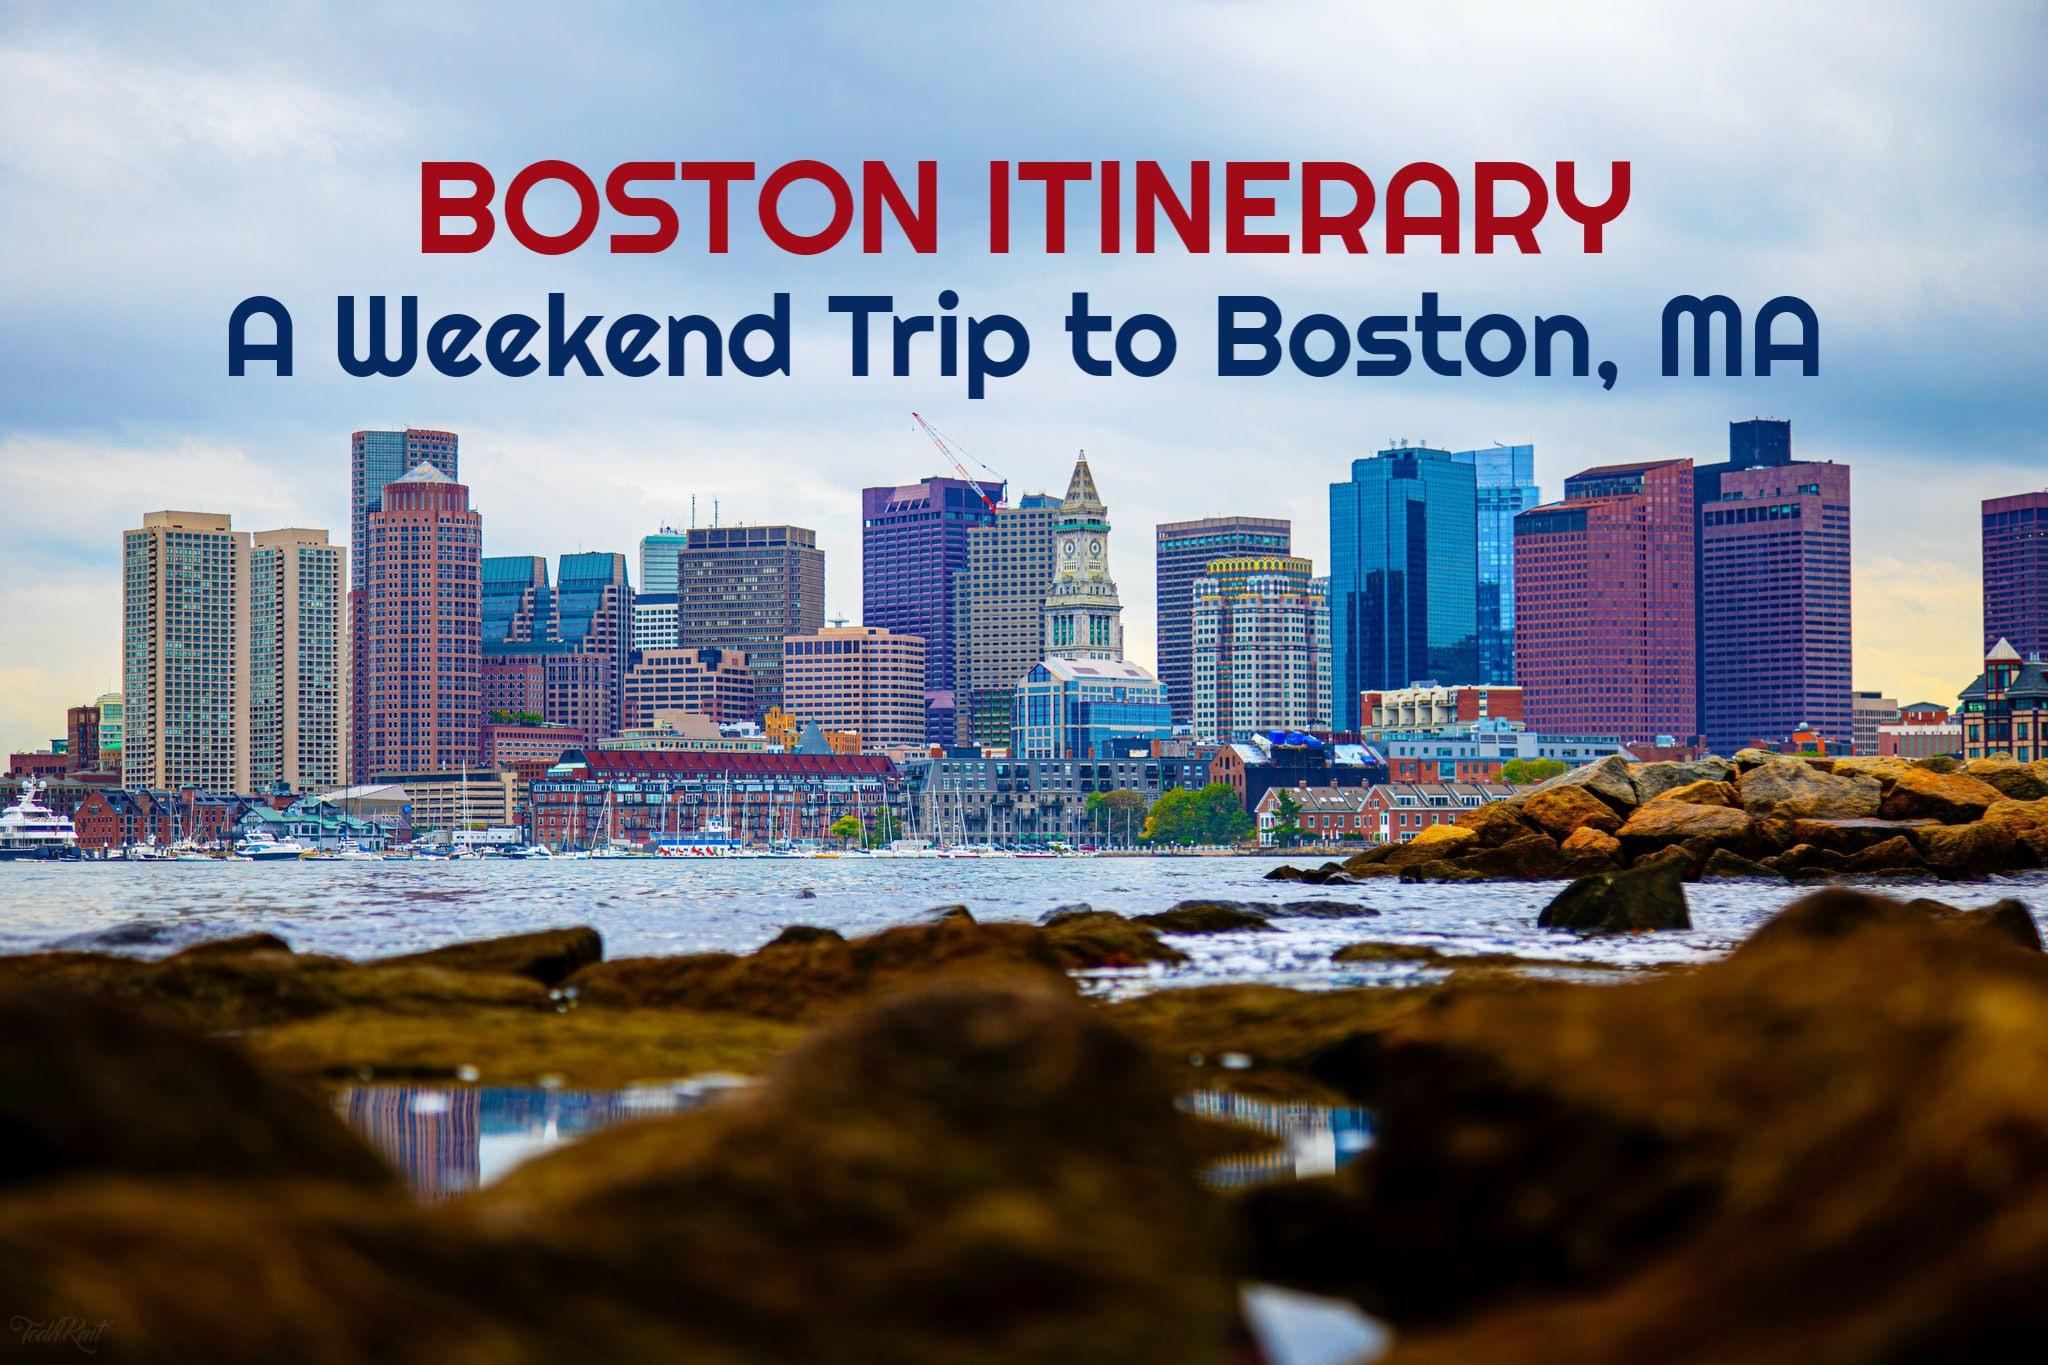 Boston Itinerary A Weekend Trip to Boston, MA by JetSettingFools.com